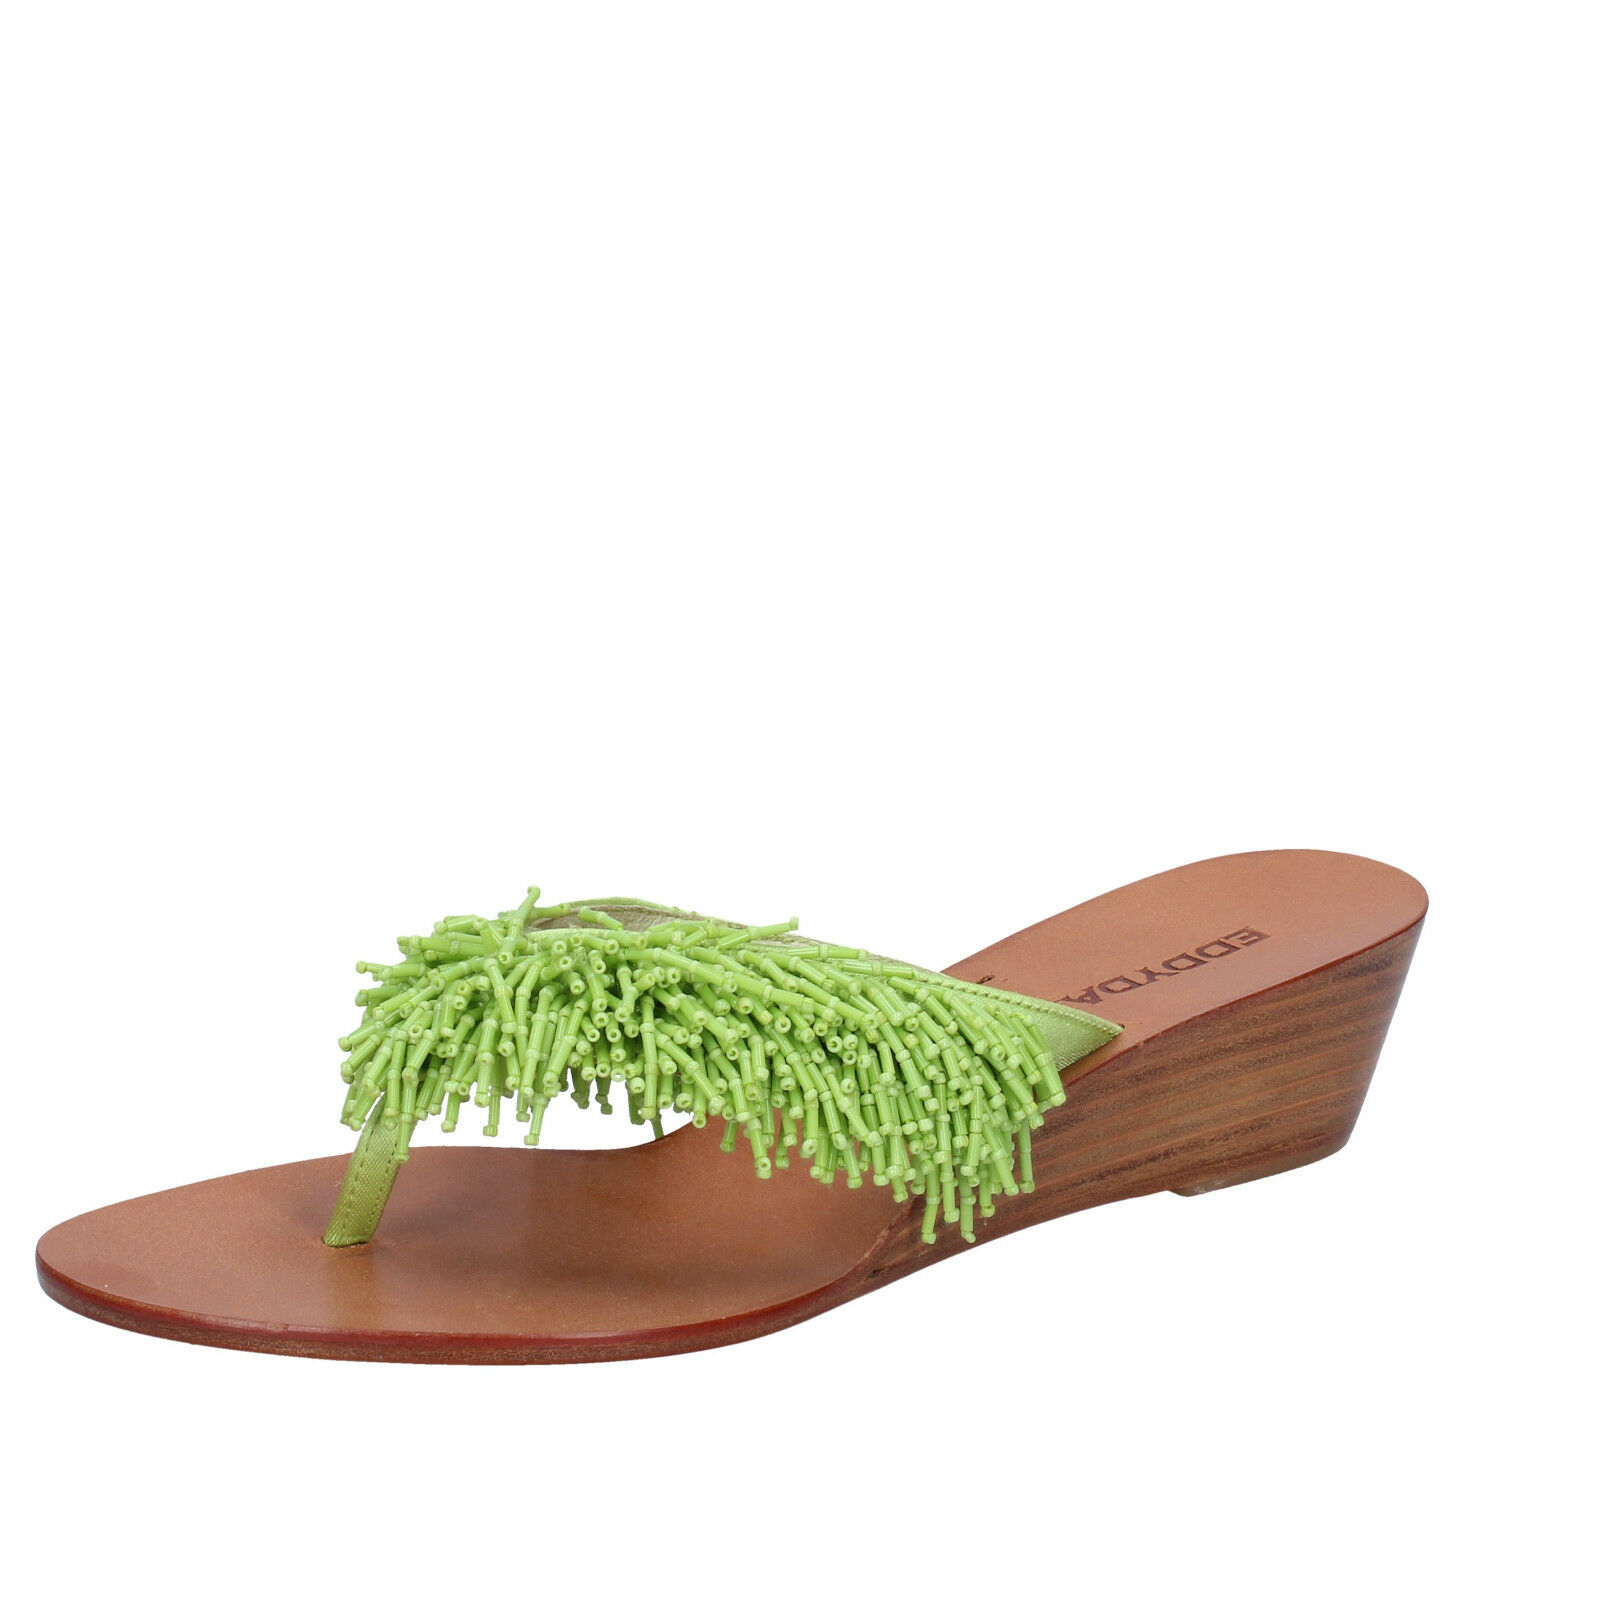 scarpe EU donna EDDY DANIELE 37 EU scarpe sandali verde raso AV410 6ea056